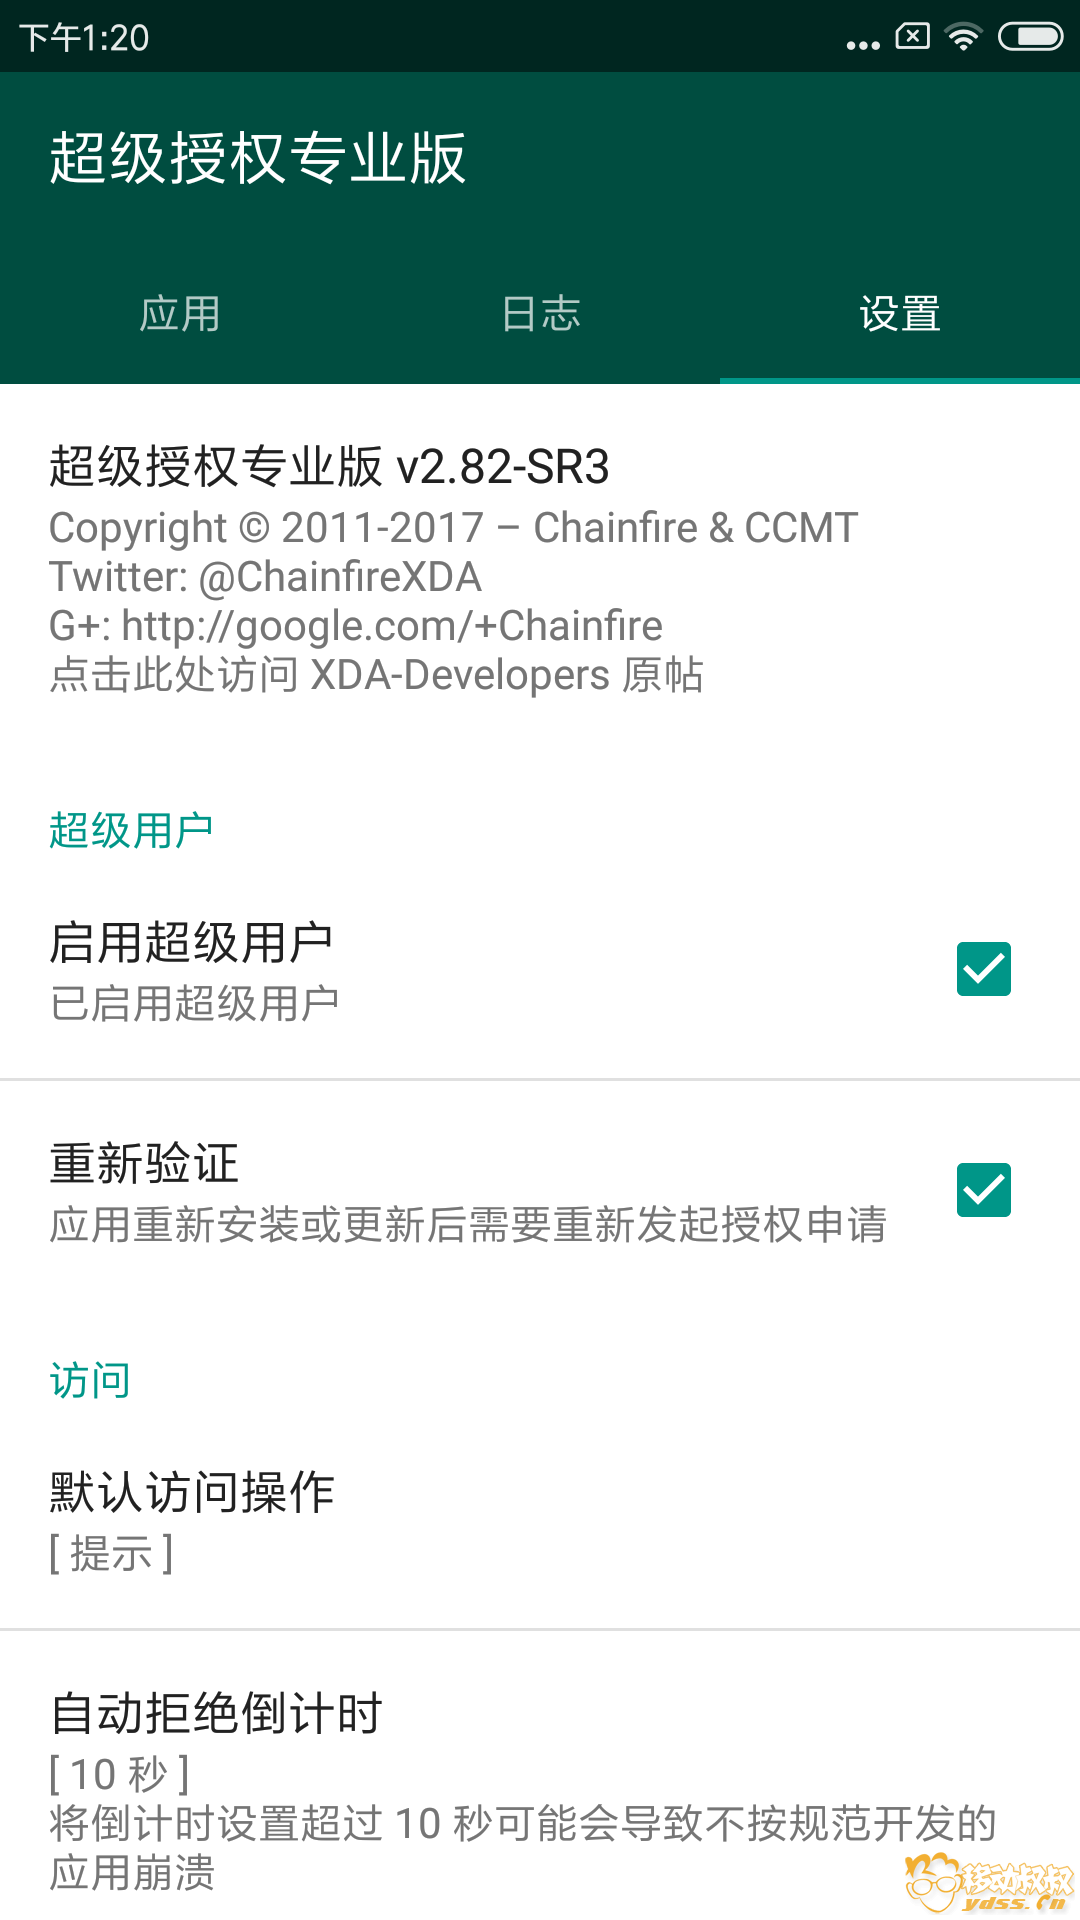 Screenshot_2018-09-30-13-20-12-810_eu.chainfire.supersu.png